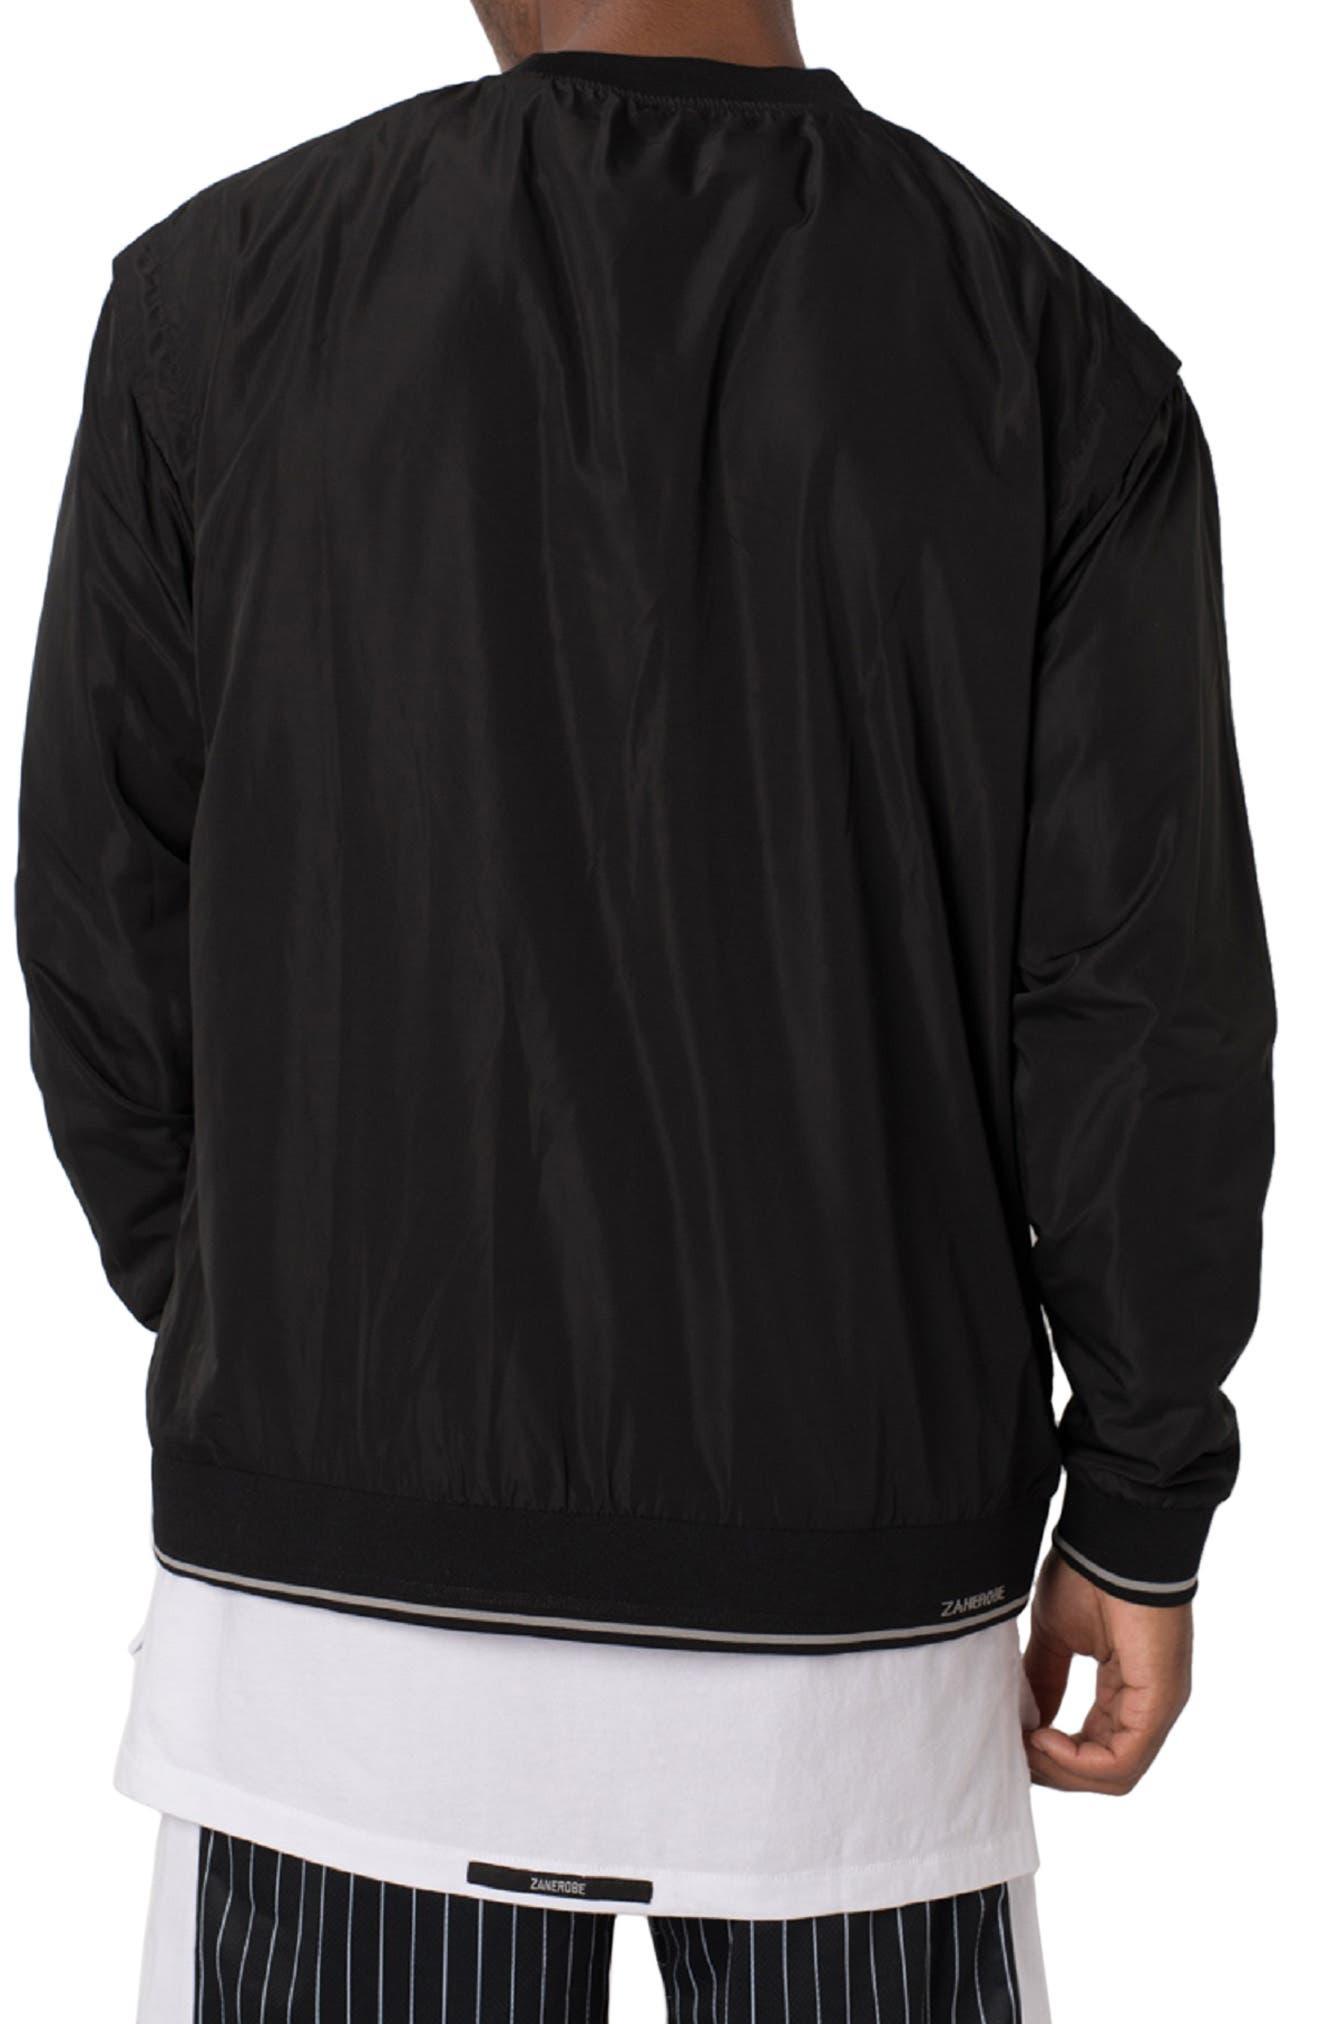 ZANEROBE,                             Jumpa Oversize Crewneck Sweatshirt,                             Alternate thumbnail 2, color,                             BLACK